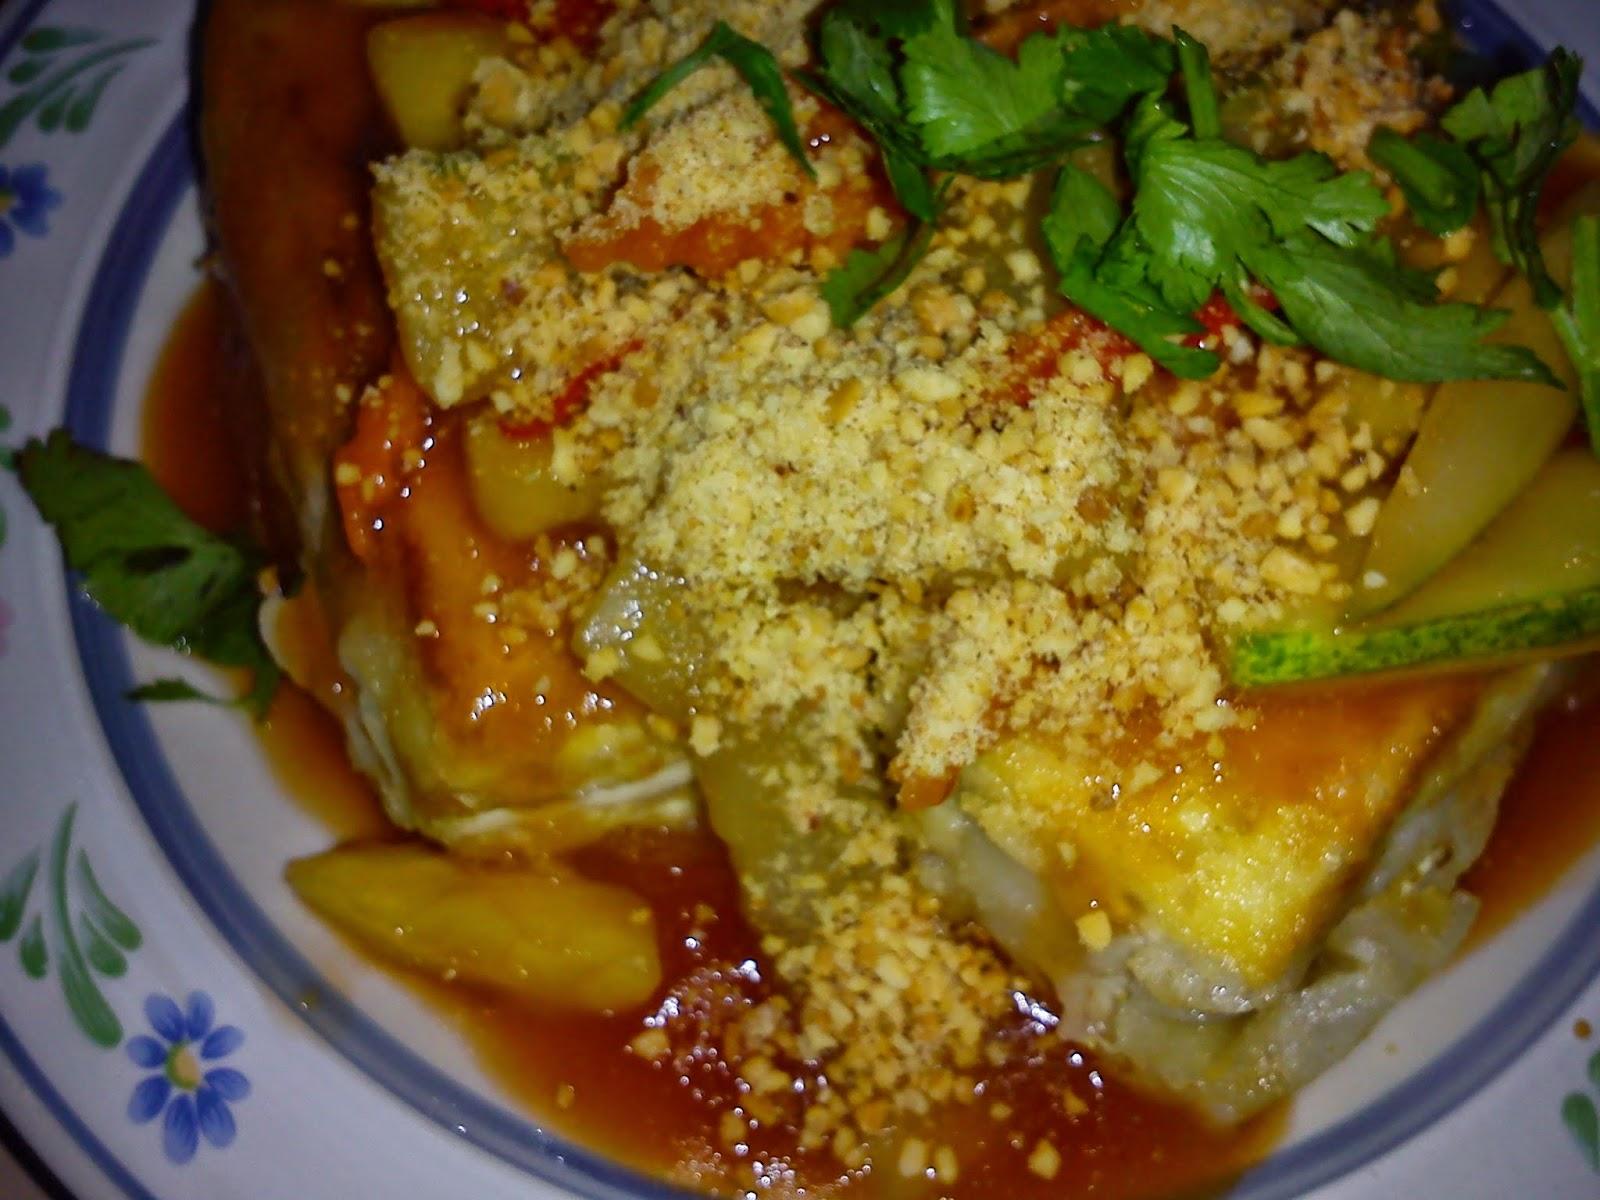 Cooking Pleasure: Vegetarian Fried Tofu in Sweet and Sour Sauce